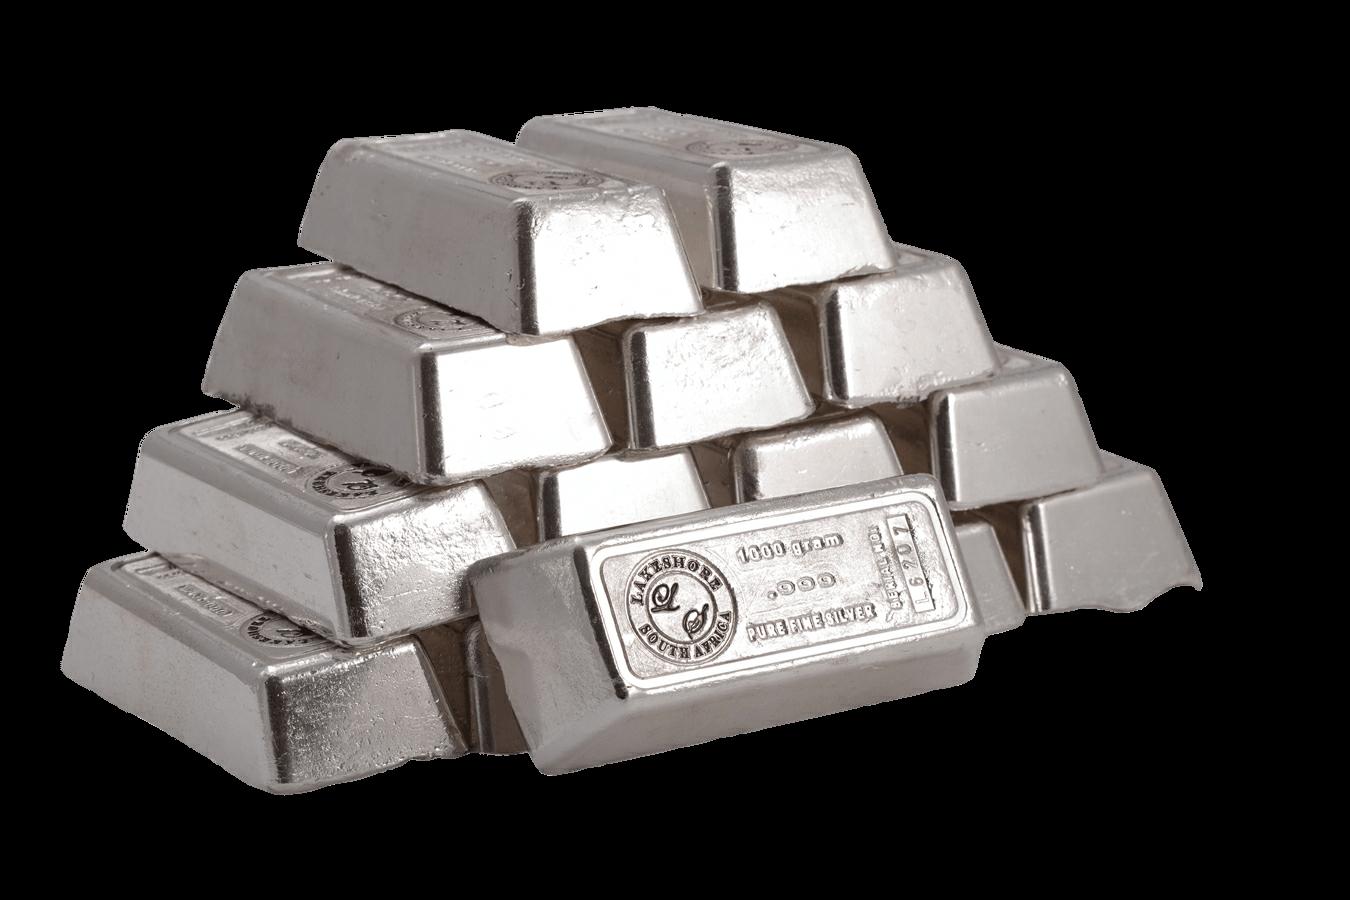 Silver Ingots Transparent Png Stickpng